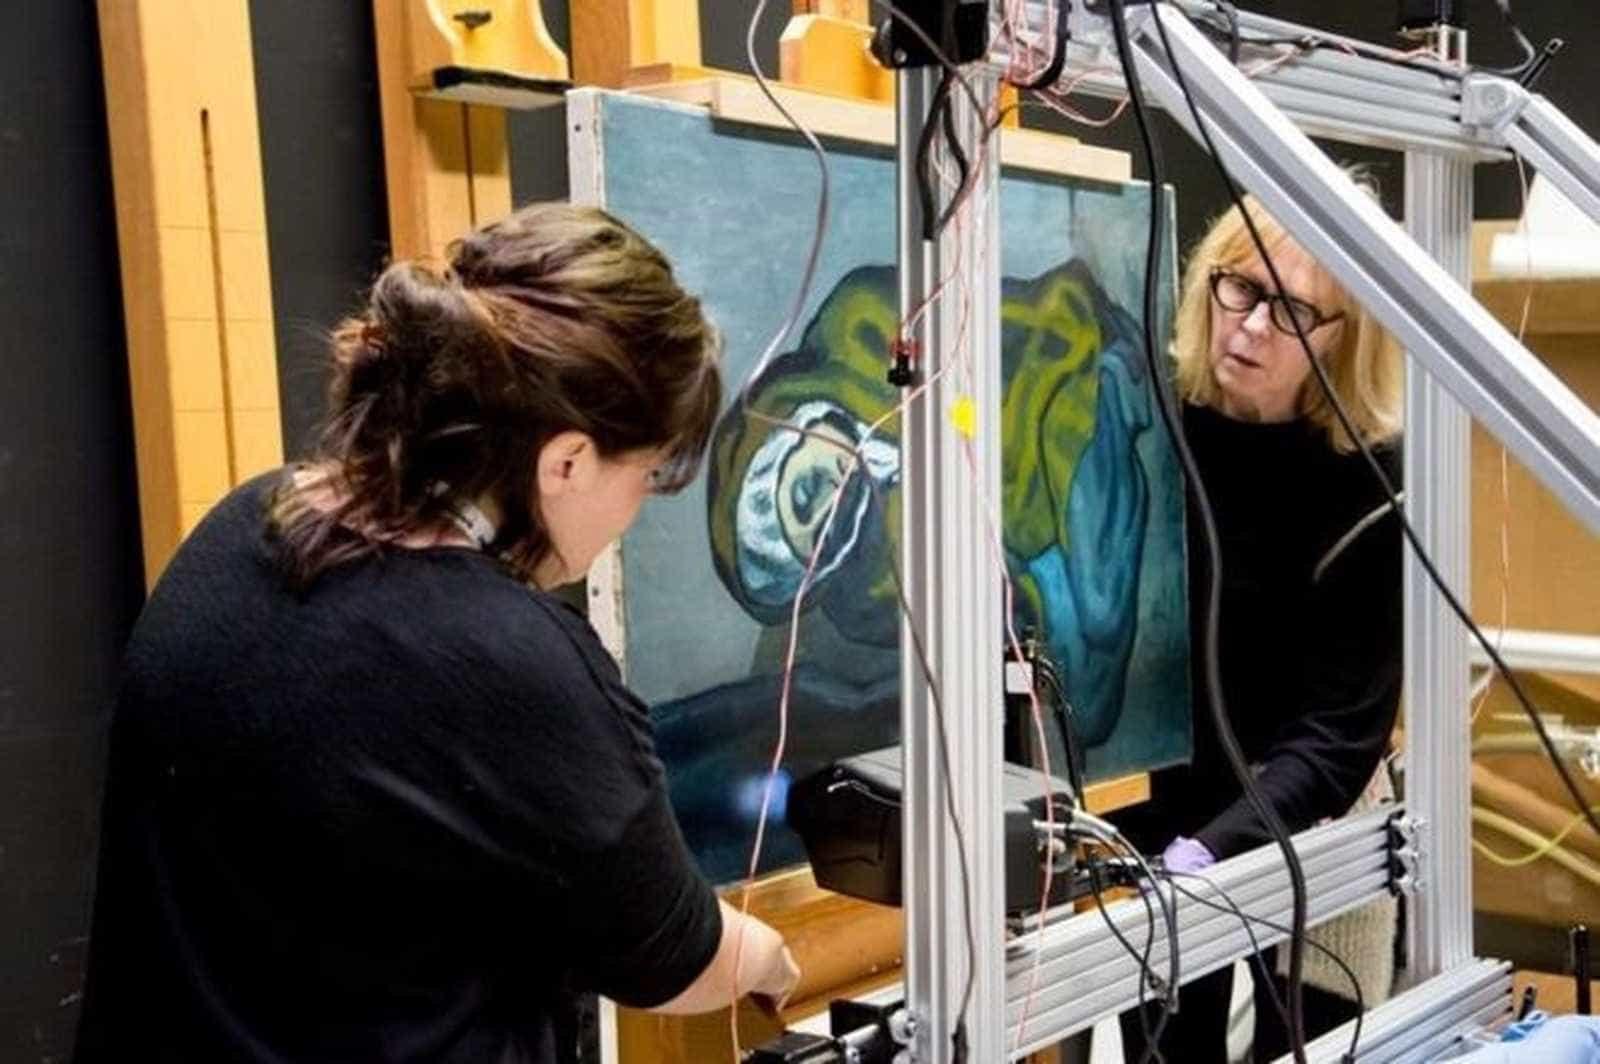 Quadro de Picasso esconde pintura de outro artista